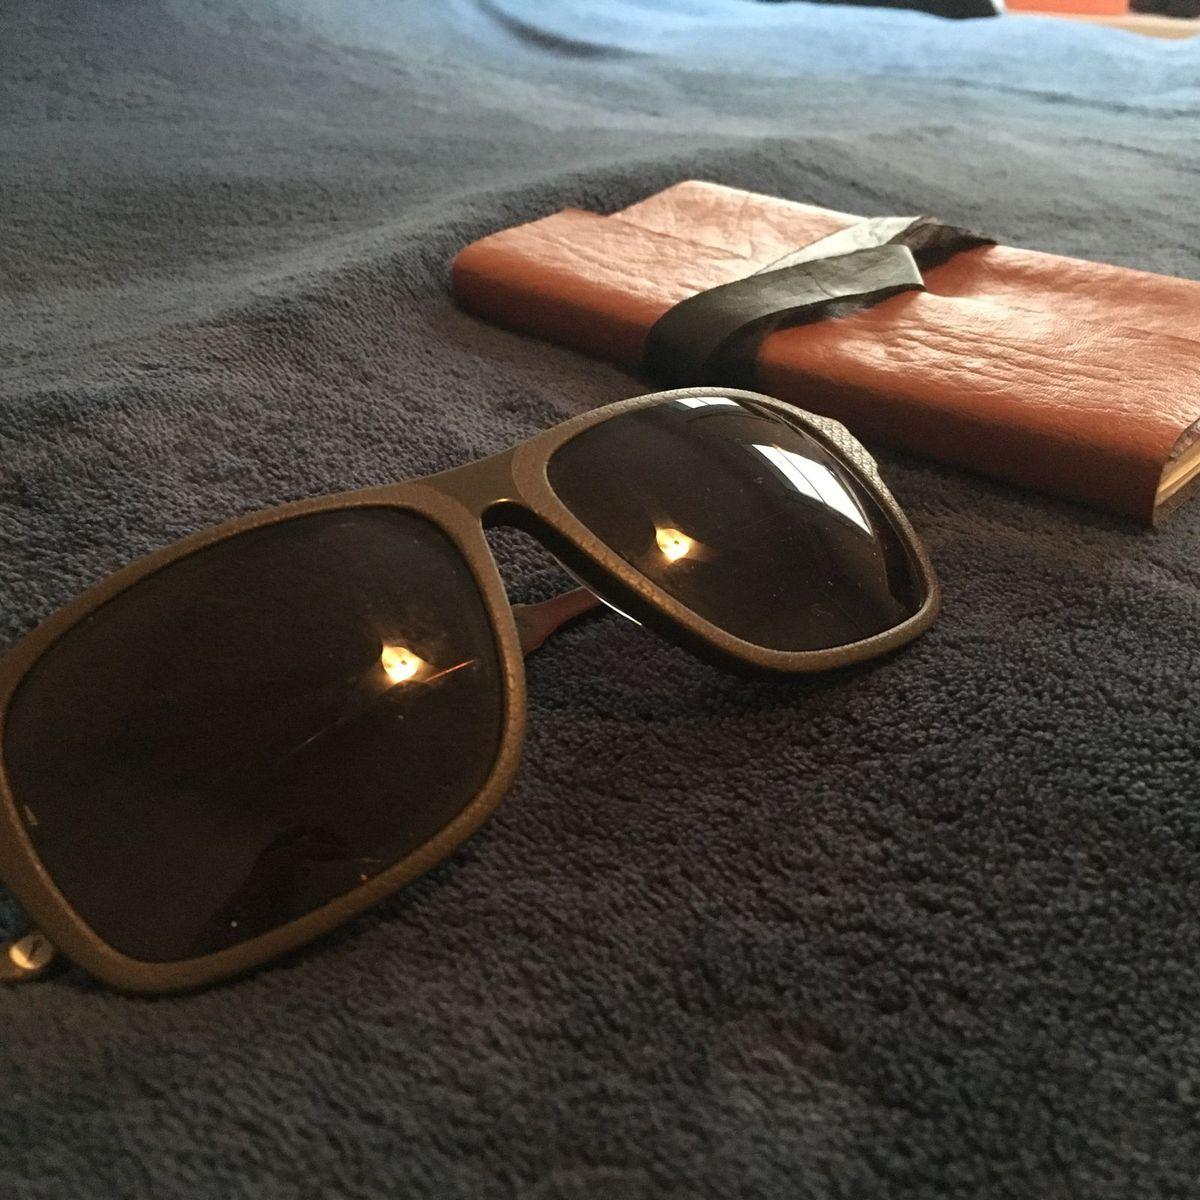 a6720eb61 Óculos Chilli Beans - Alexandre Herchcovitch | Óculos Masculino Chilli Beans  Usado 19509230 | enjoei